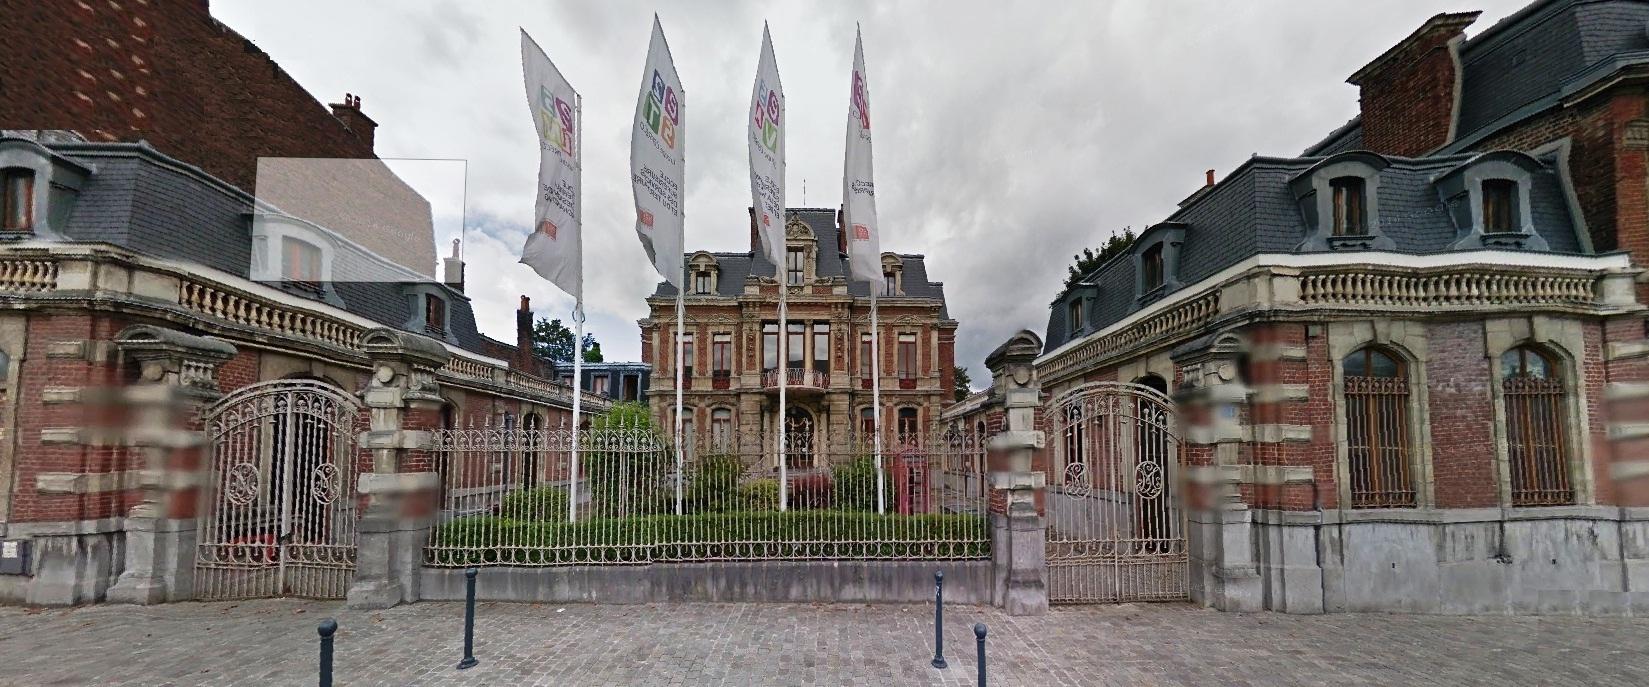 Boulevard-Paris-64-Roubaix